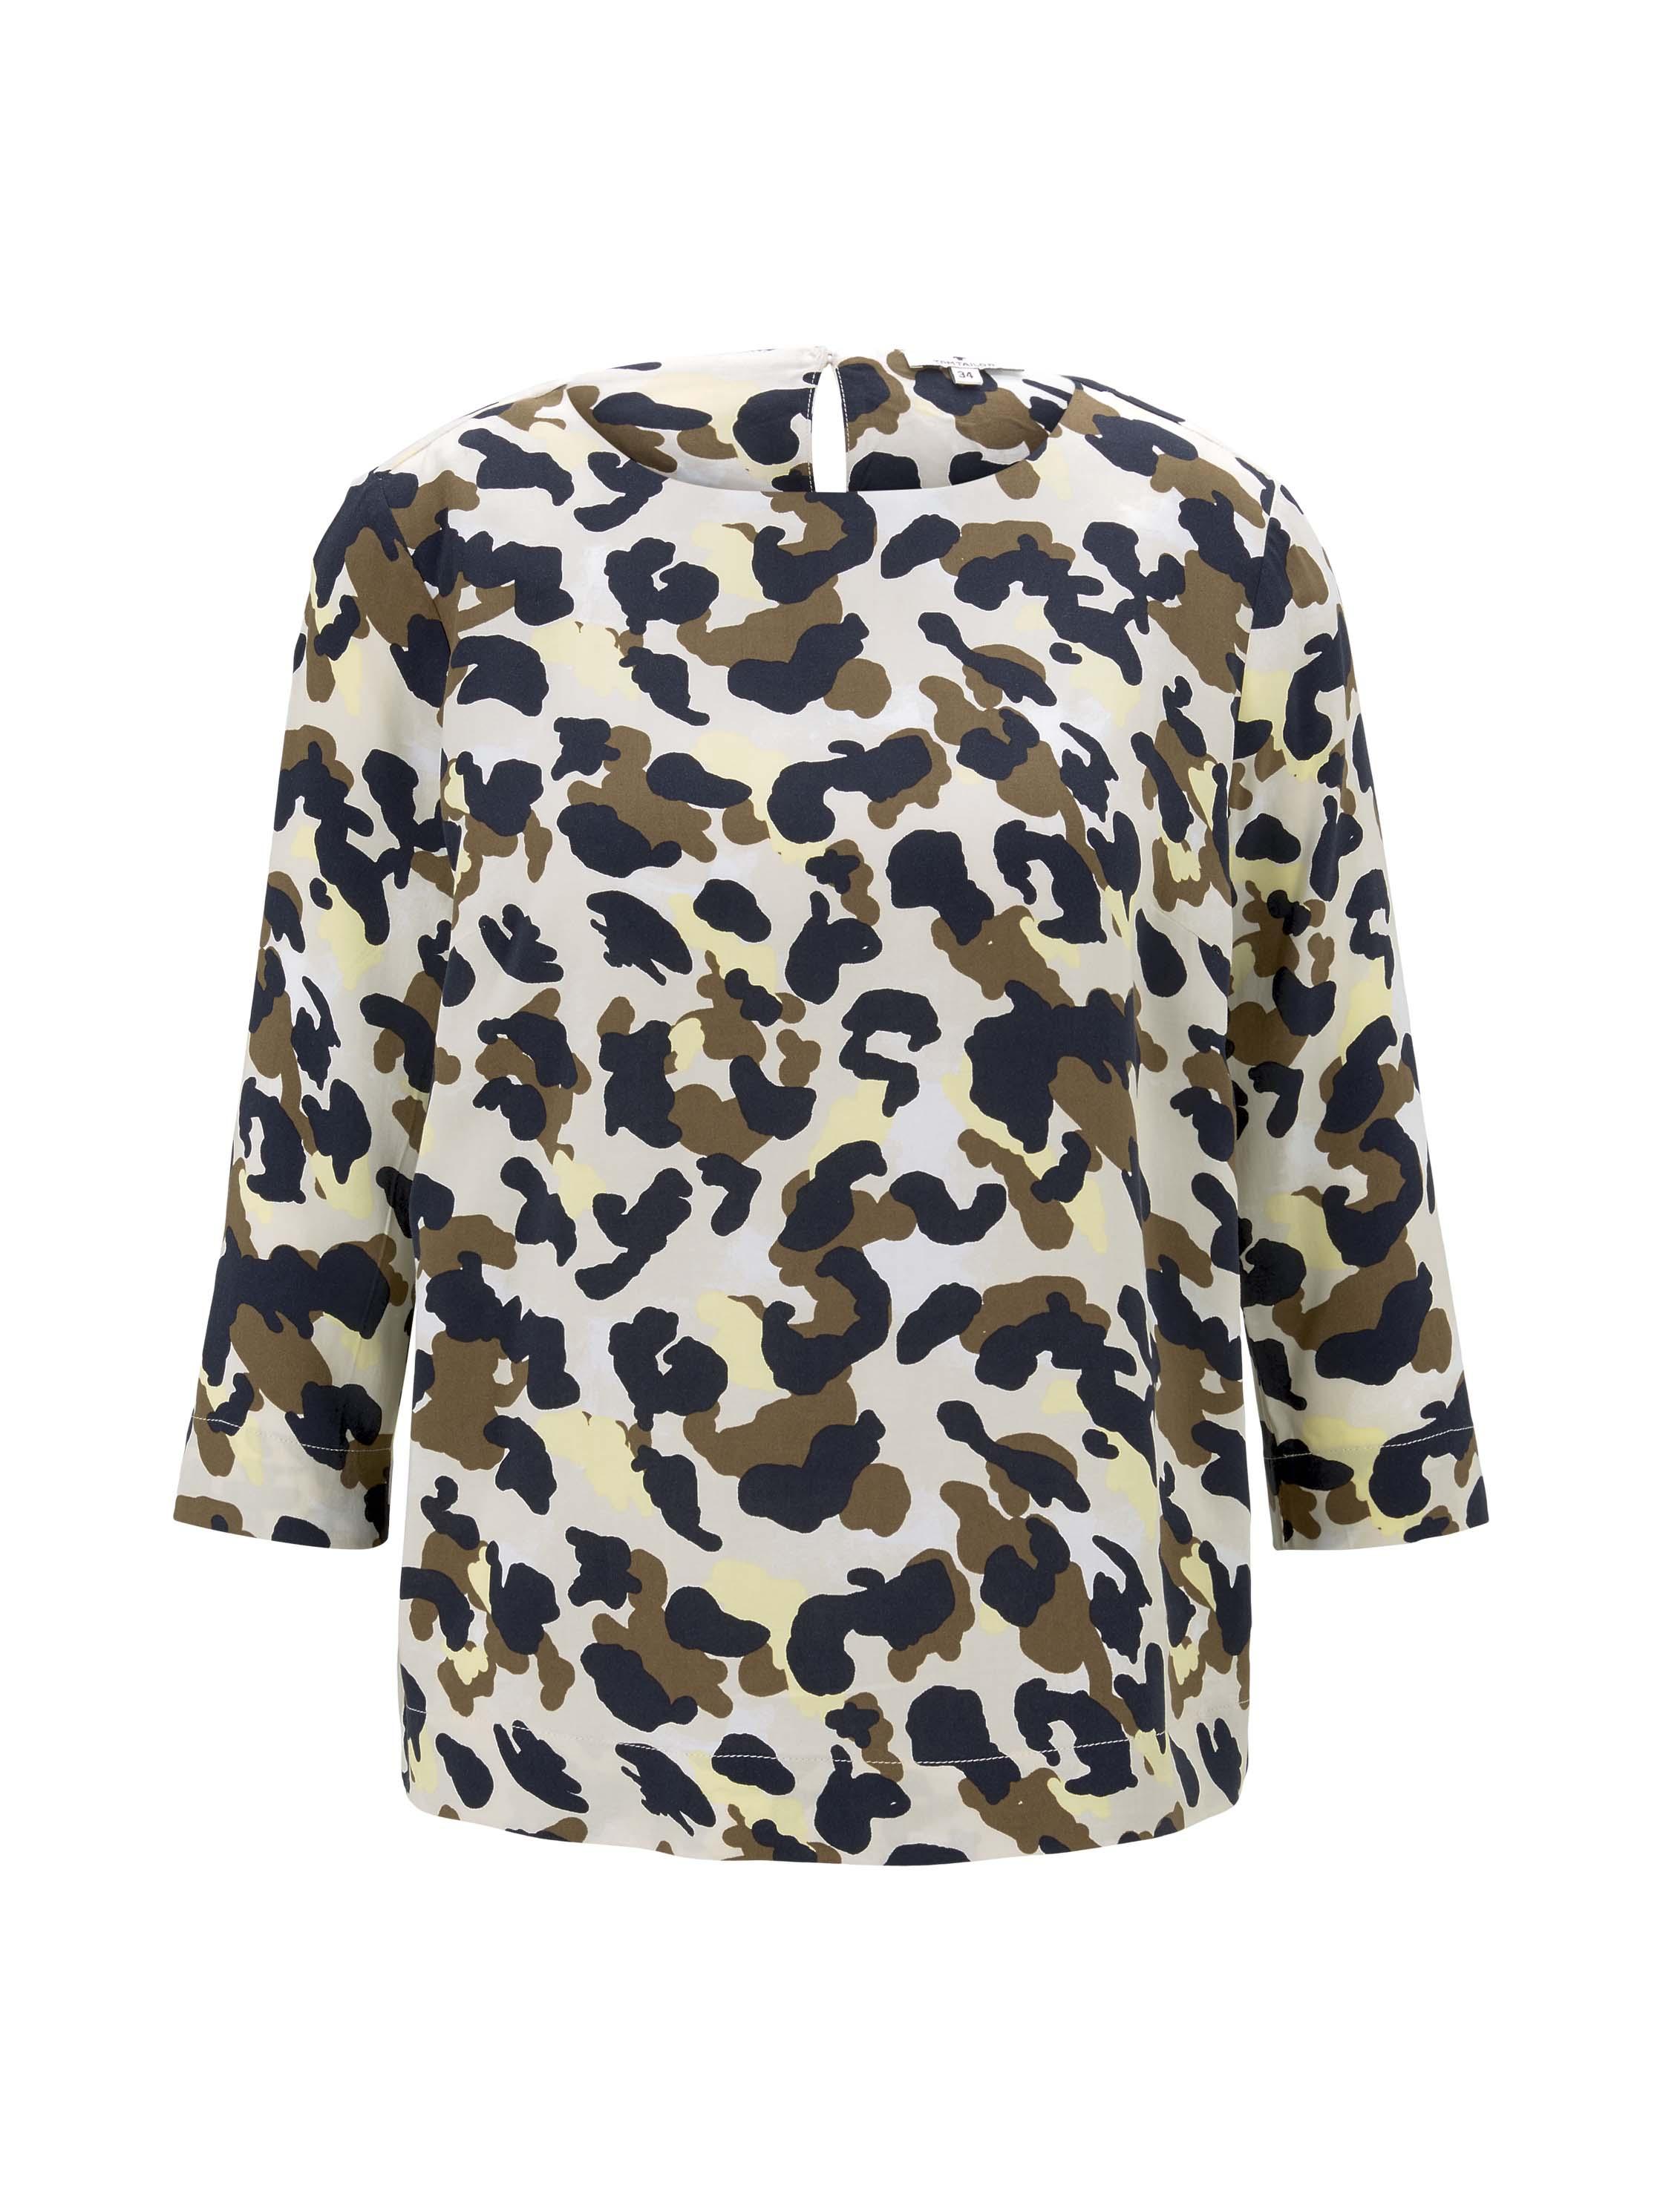 blouse easy shape, khaki yellow camouflage design